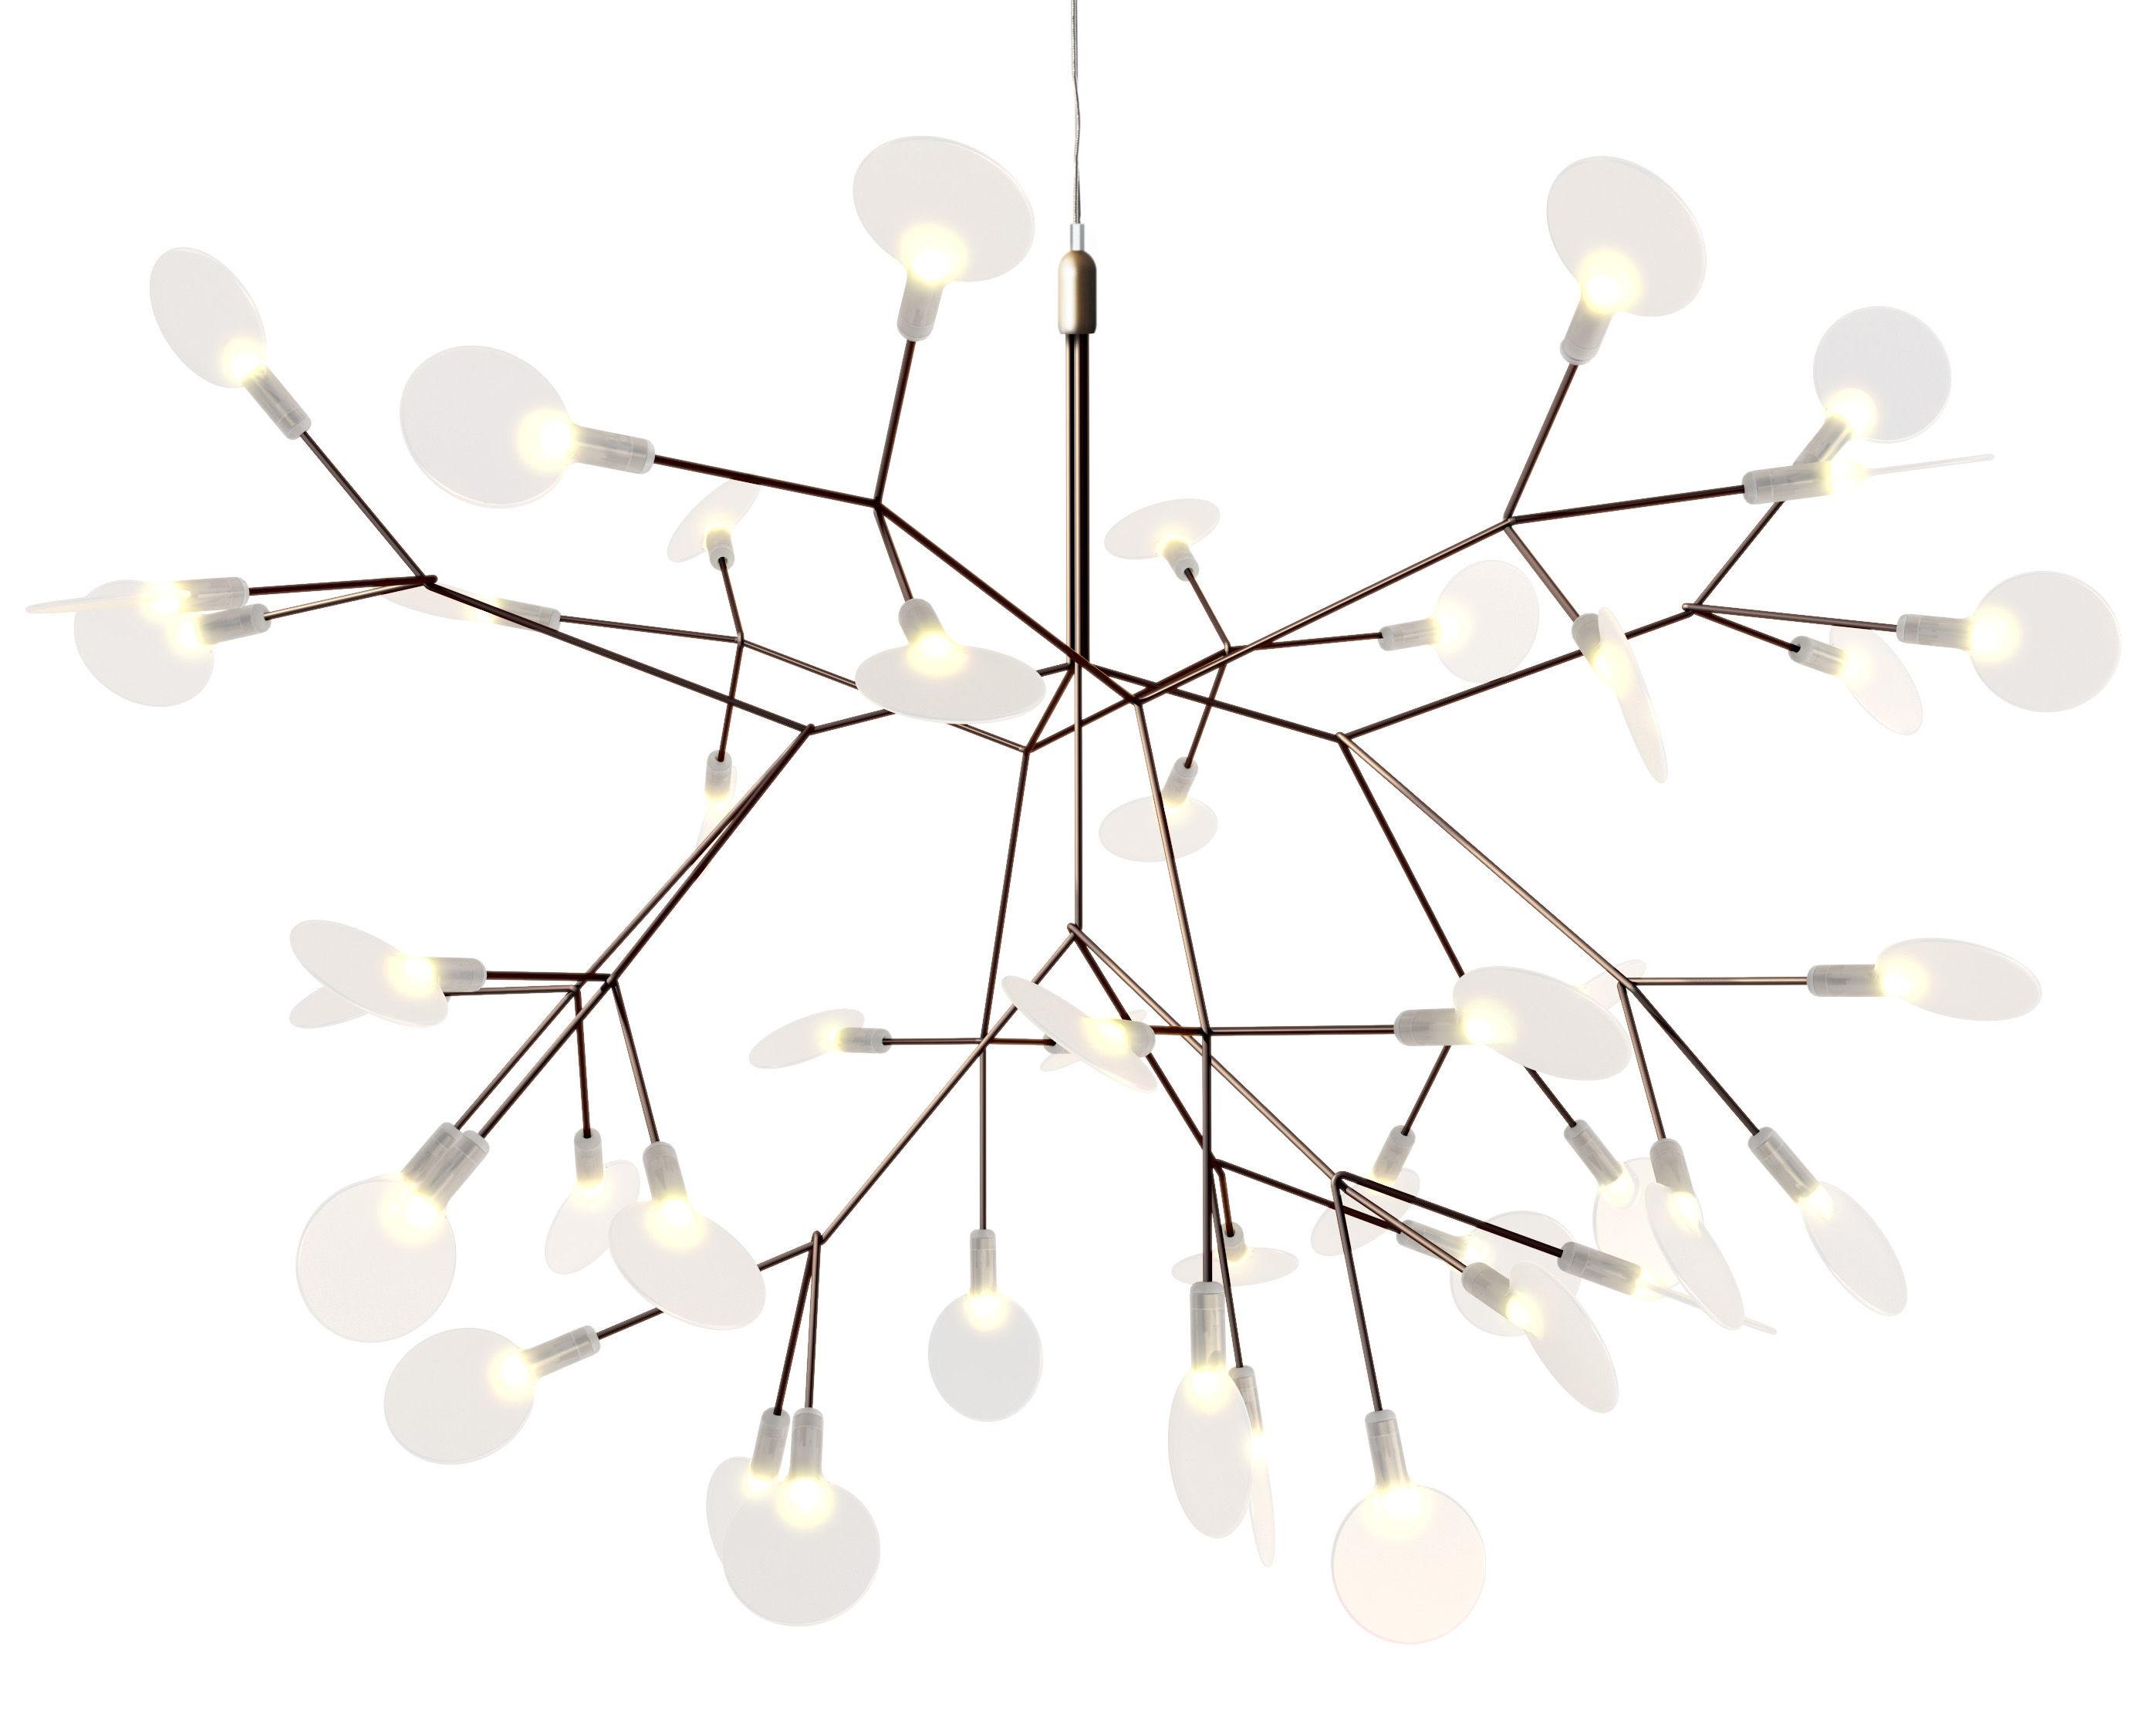 Illuminazione - Lampadari - Sospensione Heracleum II Small - / Ø 65 cm di Moooi - Rame - Acciaio, Metallo, policarbonato